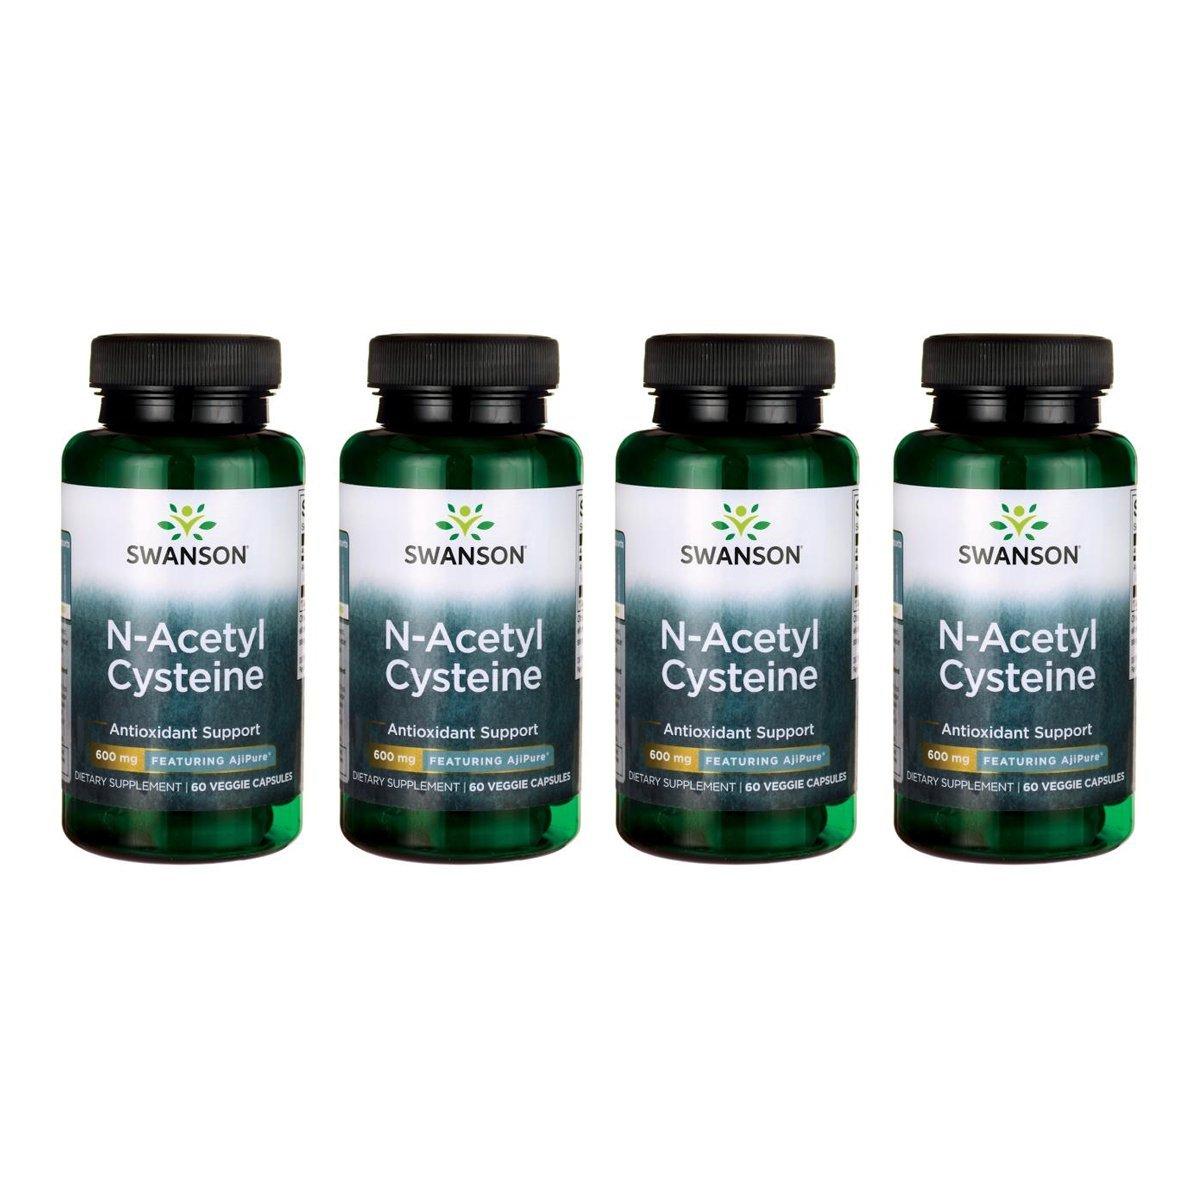 Swanson N-Acetyl L-Cysteine - Featuring Ajipure 600 mg 60 Veg Caps 4 Pack